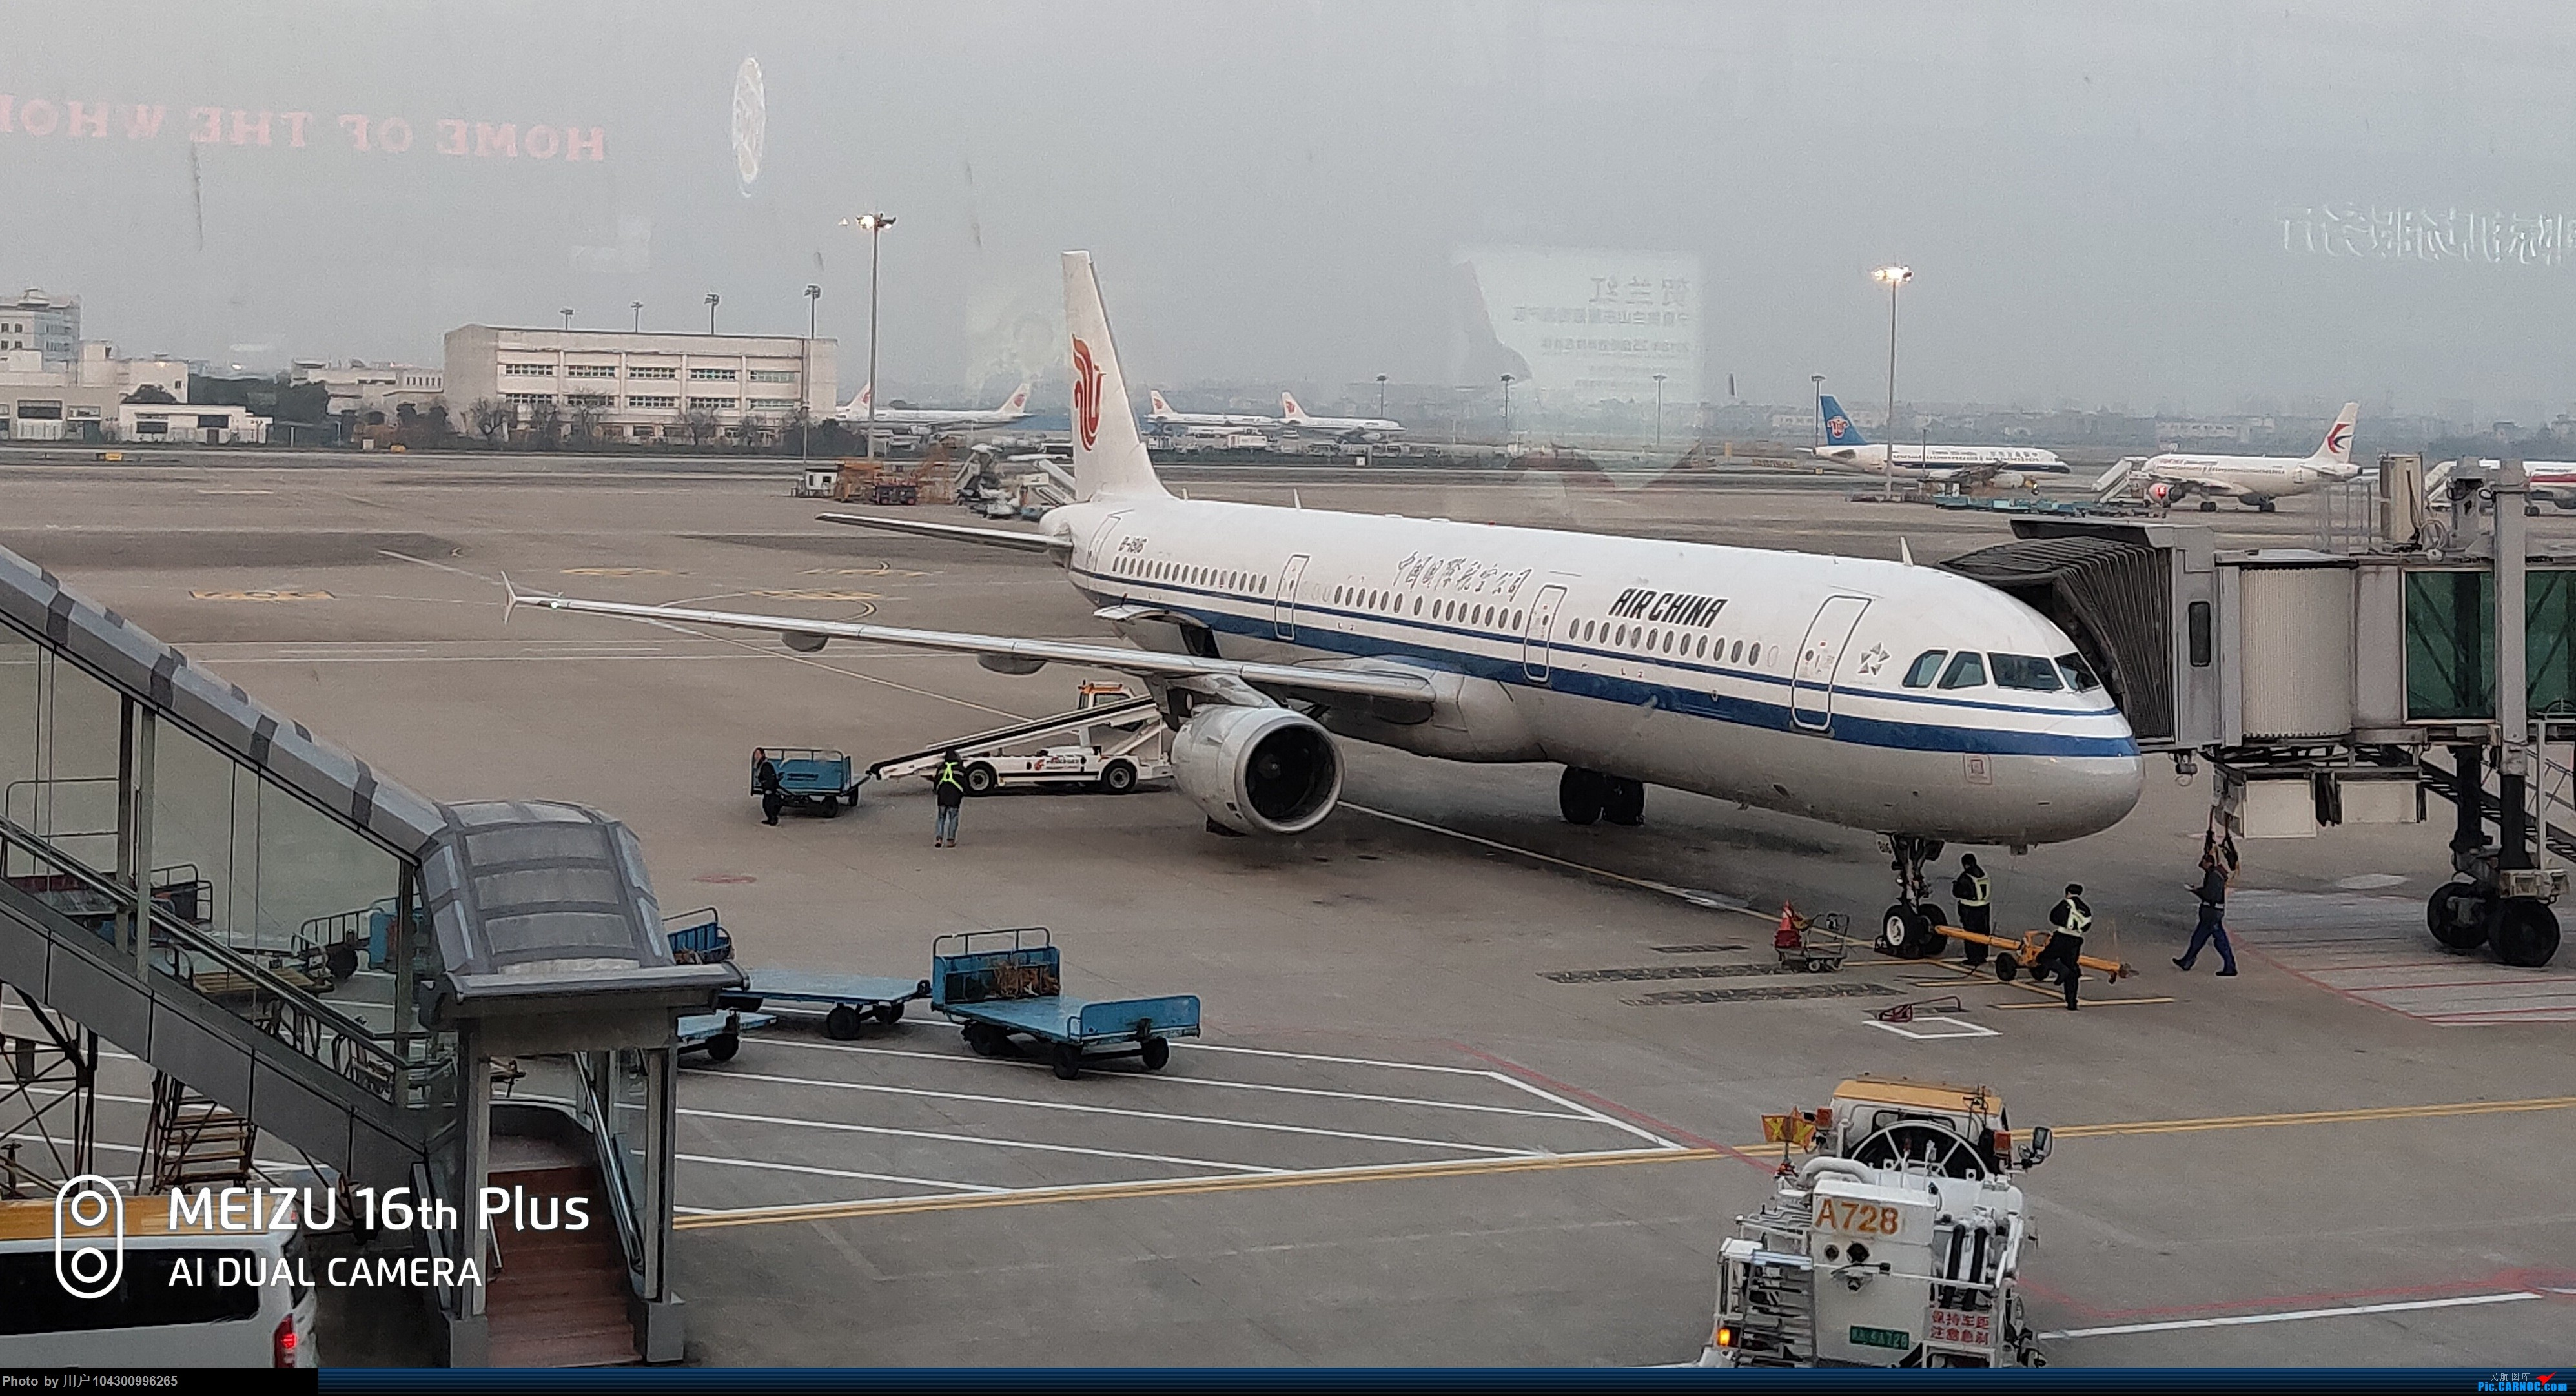 Re:[原创]囧途之贵阳--南京--杭州--贵阳 AIRBUS A321-200 B-1816 中国杭州萧山国际机场